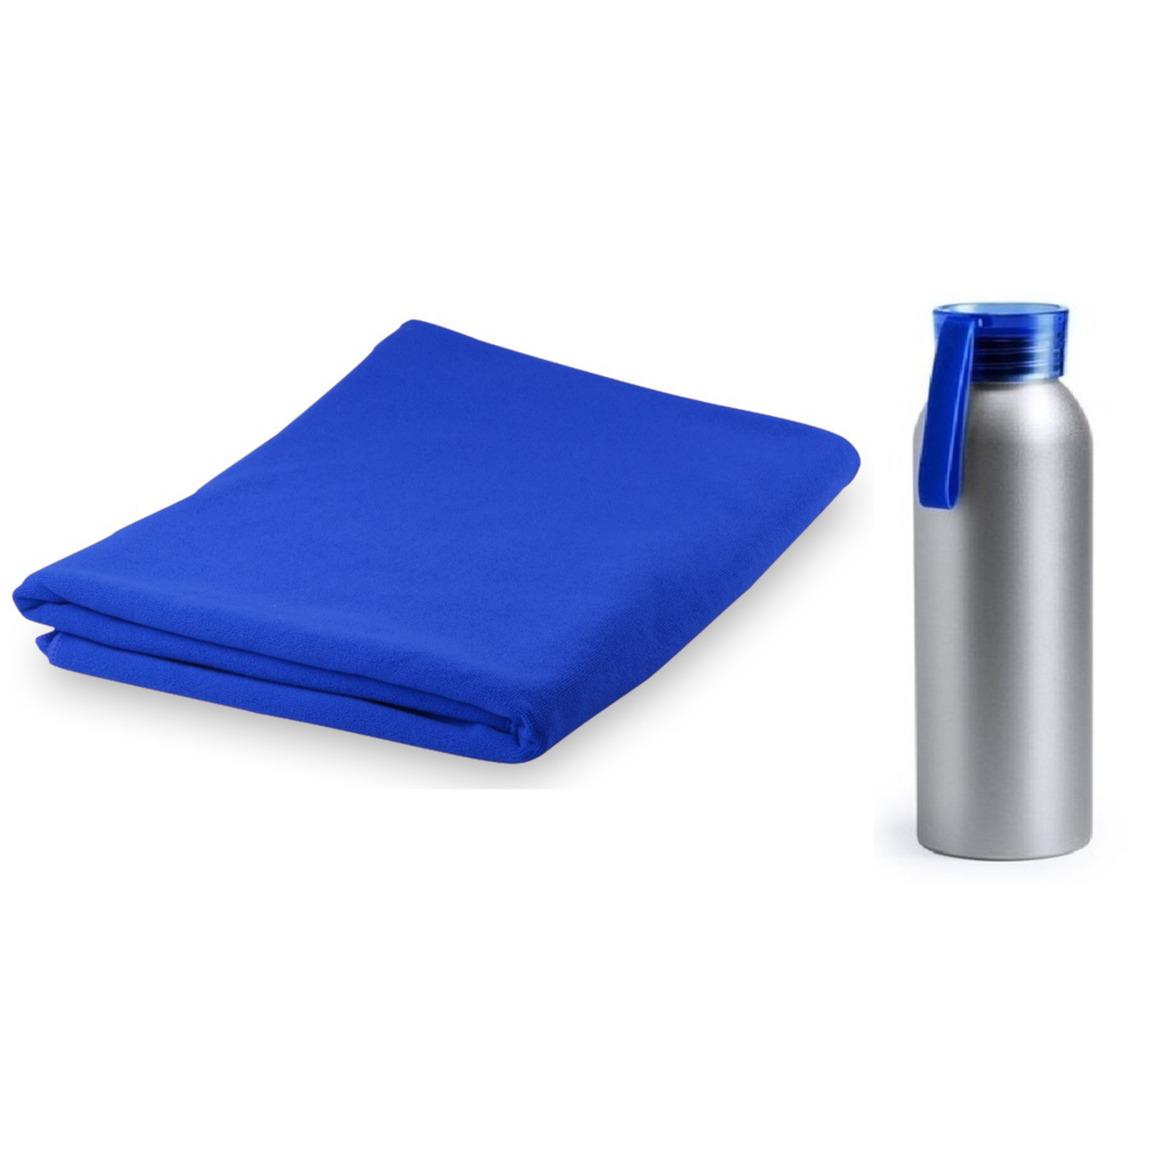 Yoga fitness set blauwe handdoek extra absorberend en bidon drinkfles